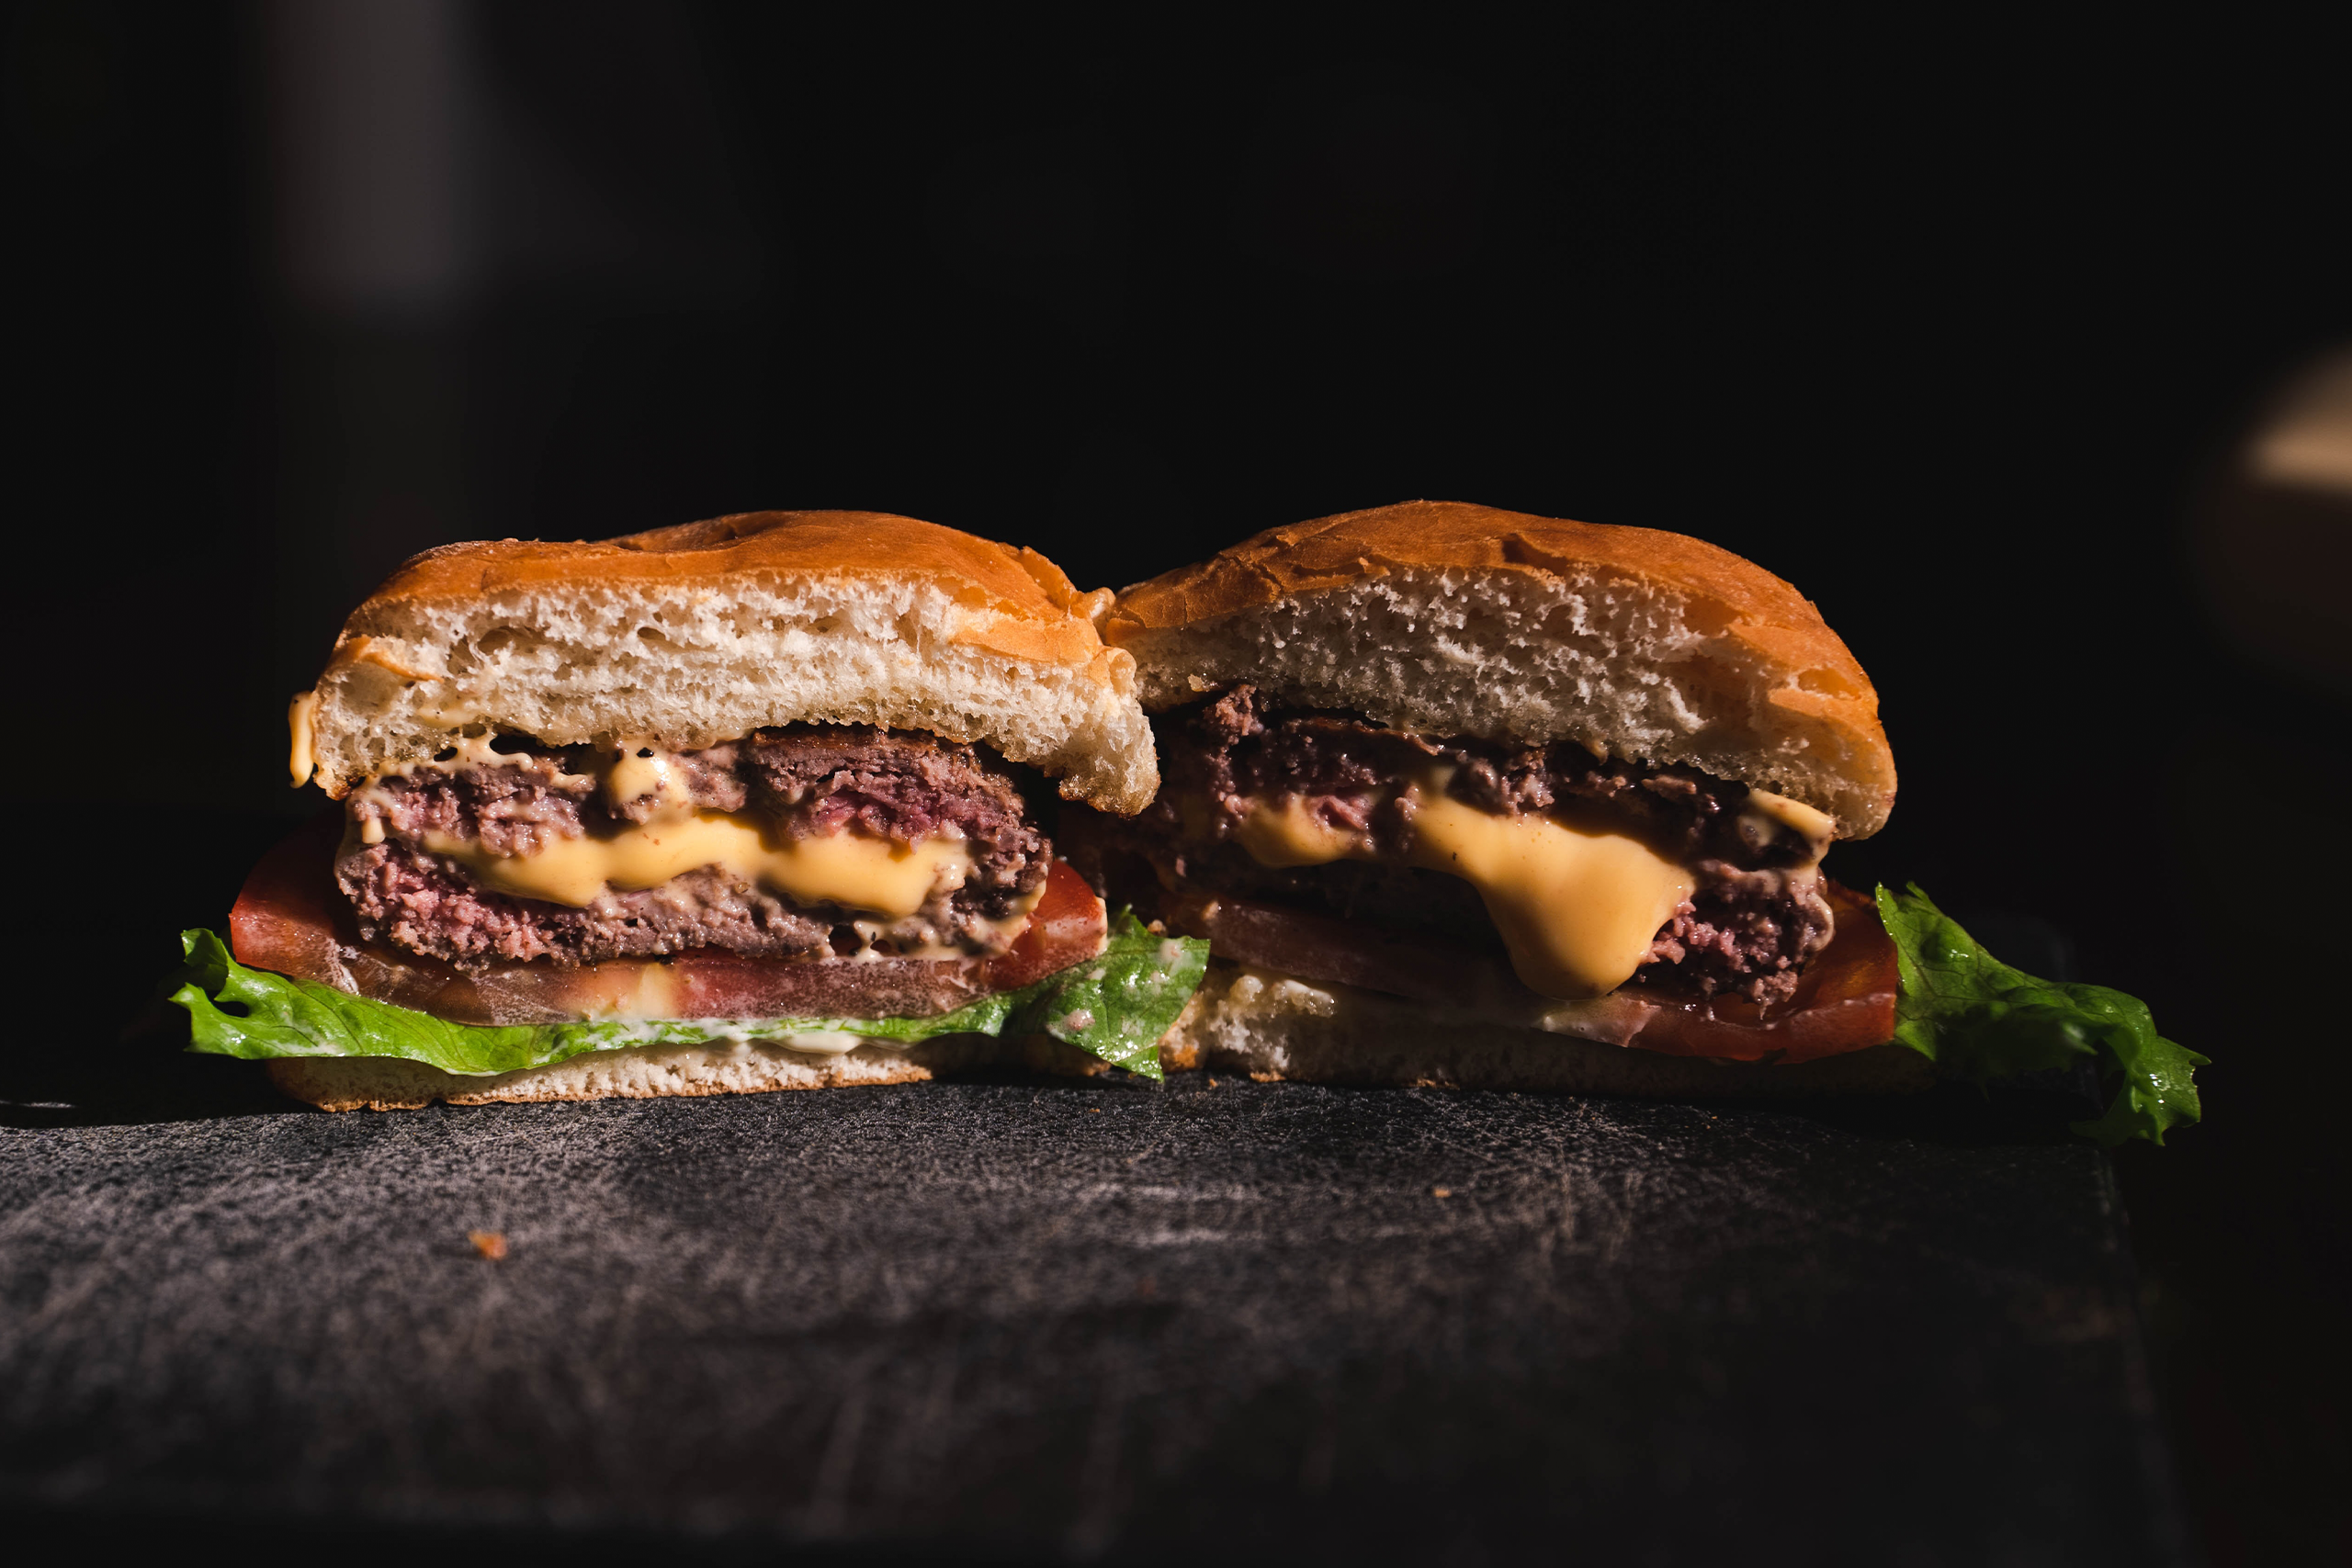 Cheddar & Jalapeño Stuffed Burgers